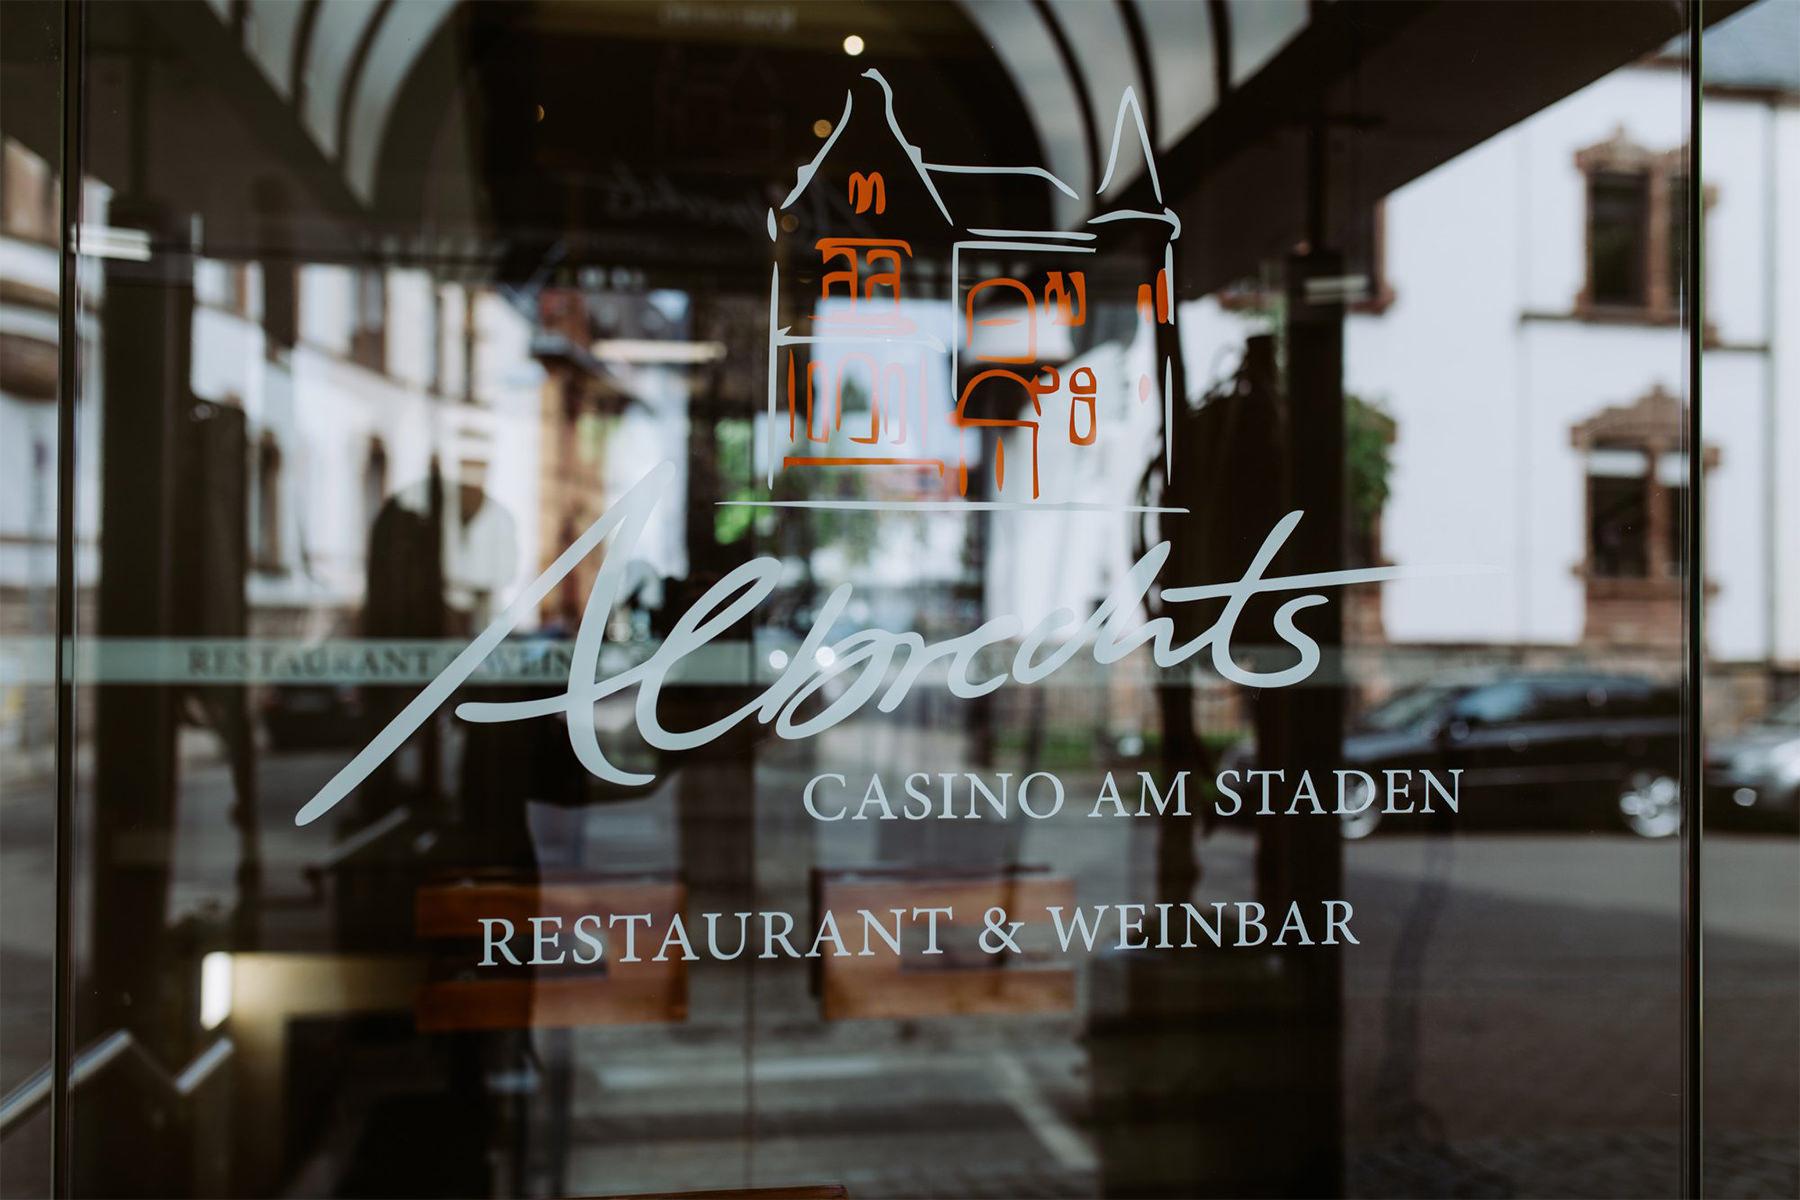 Albrechts Casino – Cuvee Creative – 12